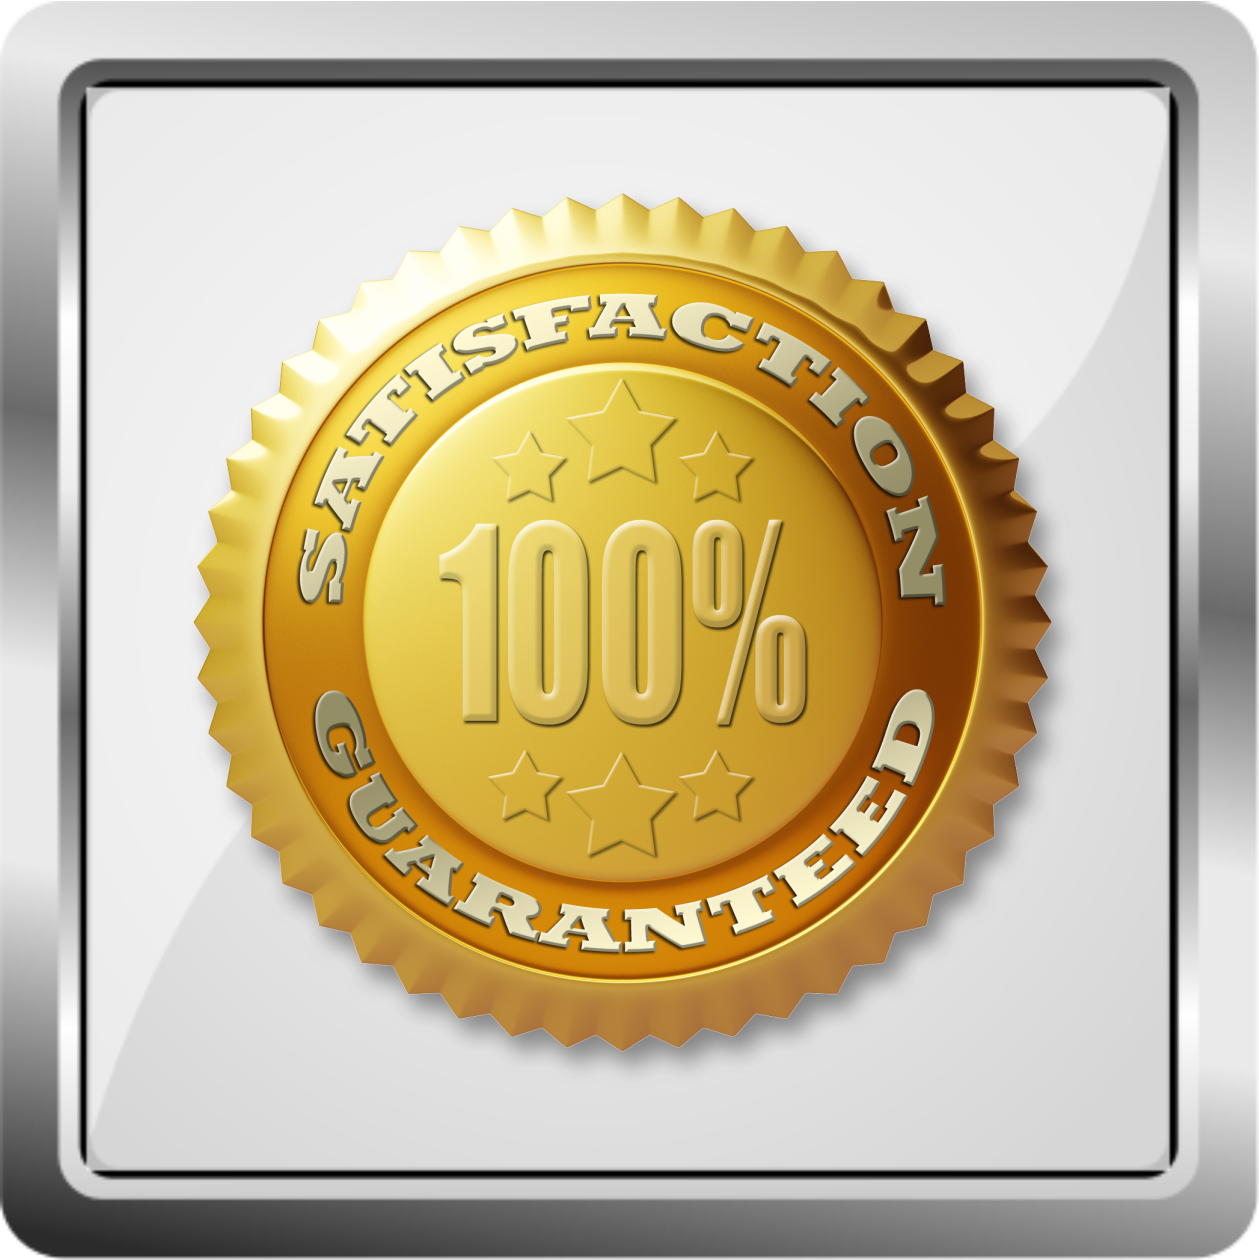 100% Satisfaction - Customer service